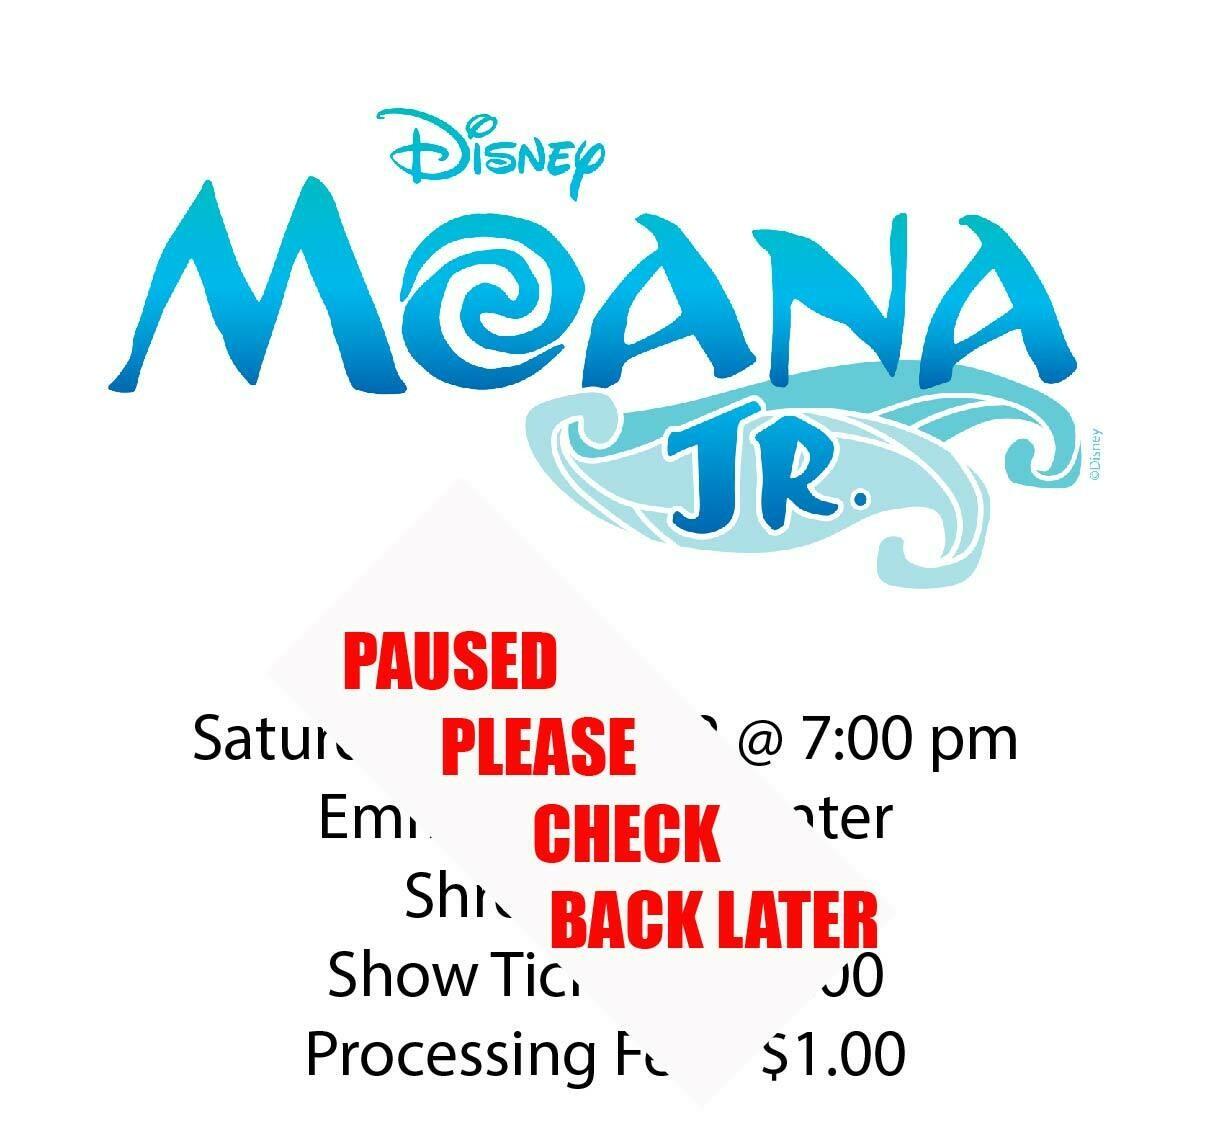 Disney's Moana JR., Saturday January 2nd @ 7:00 pm